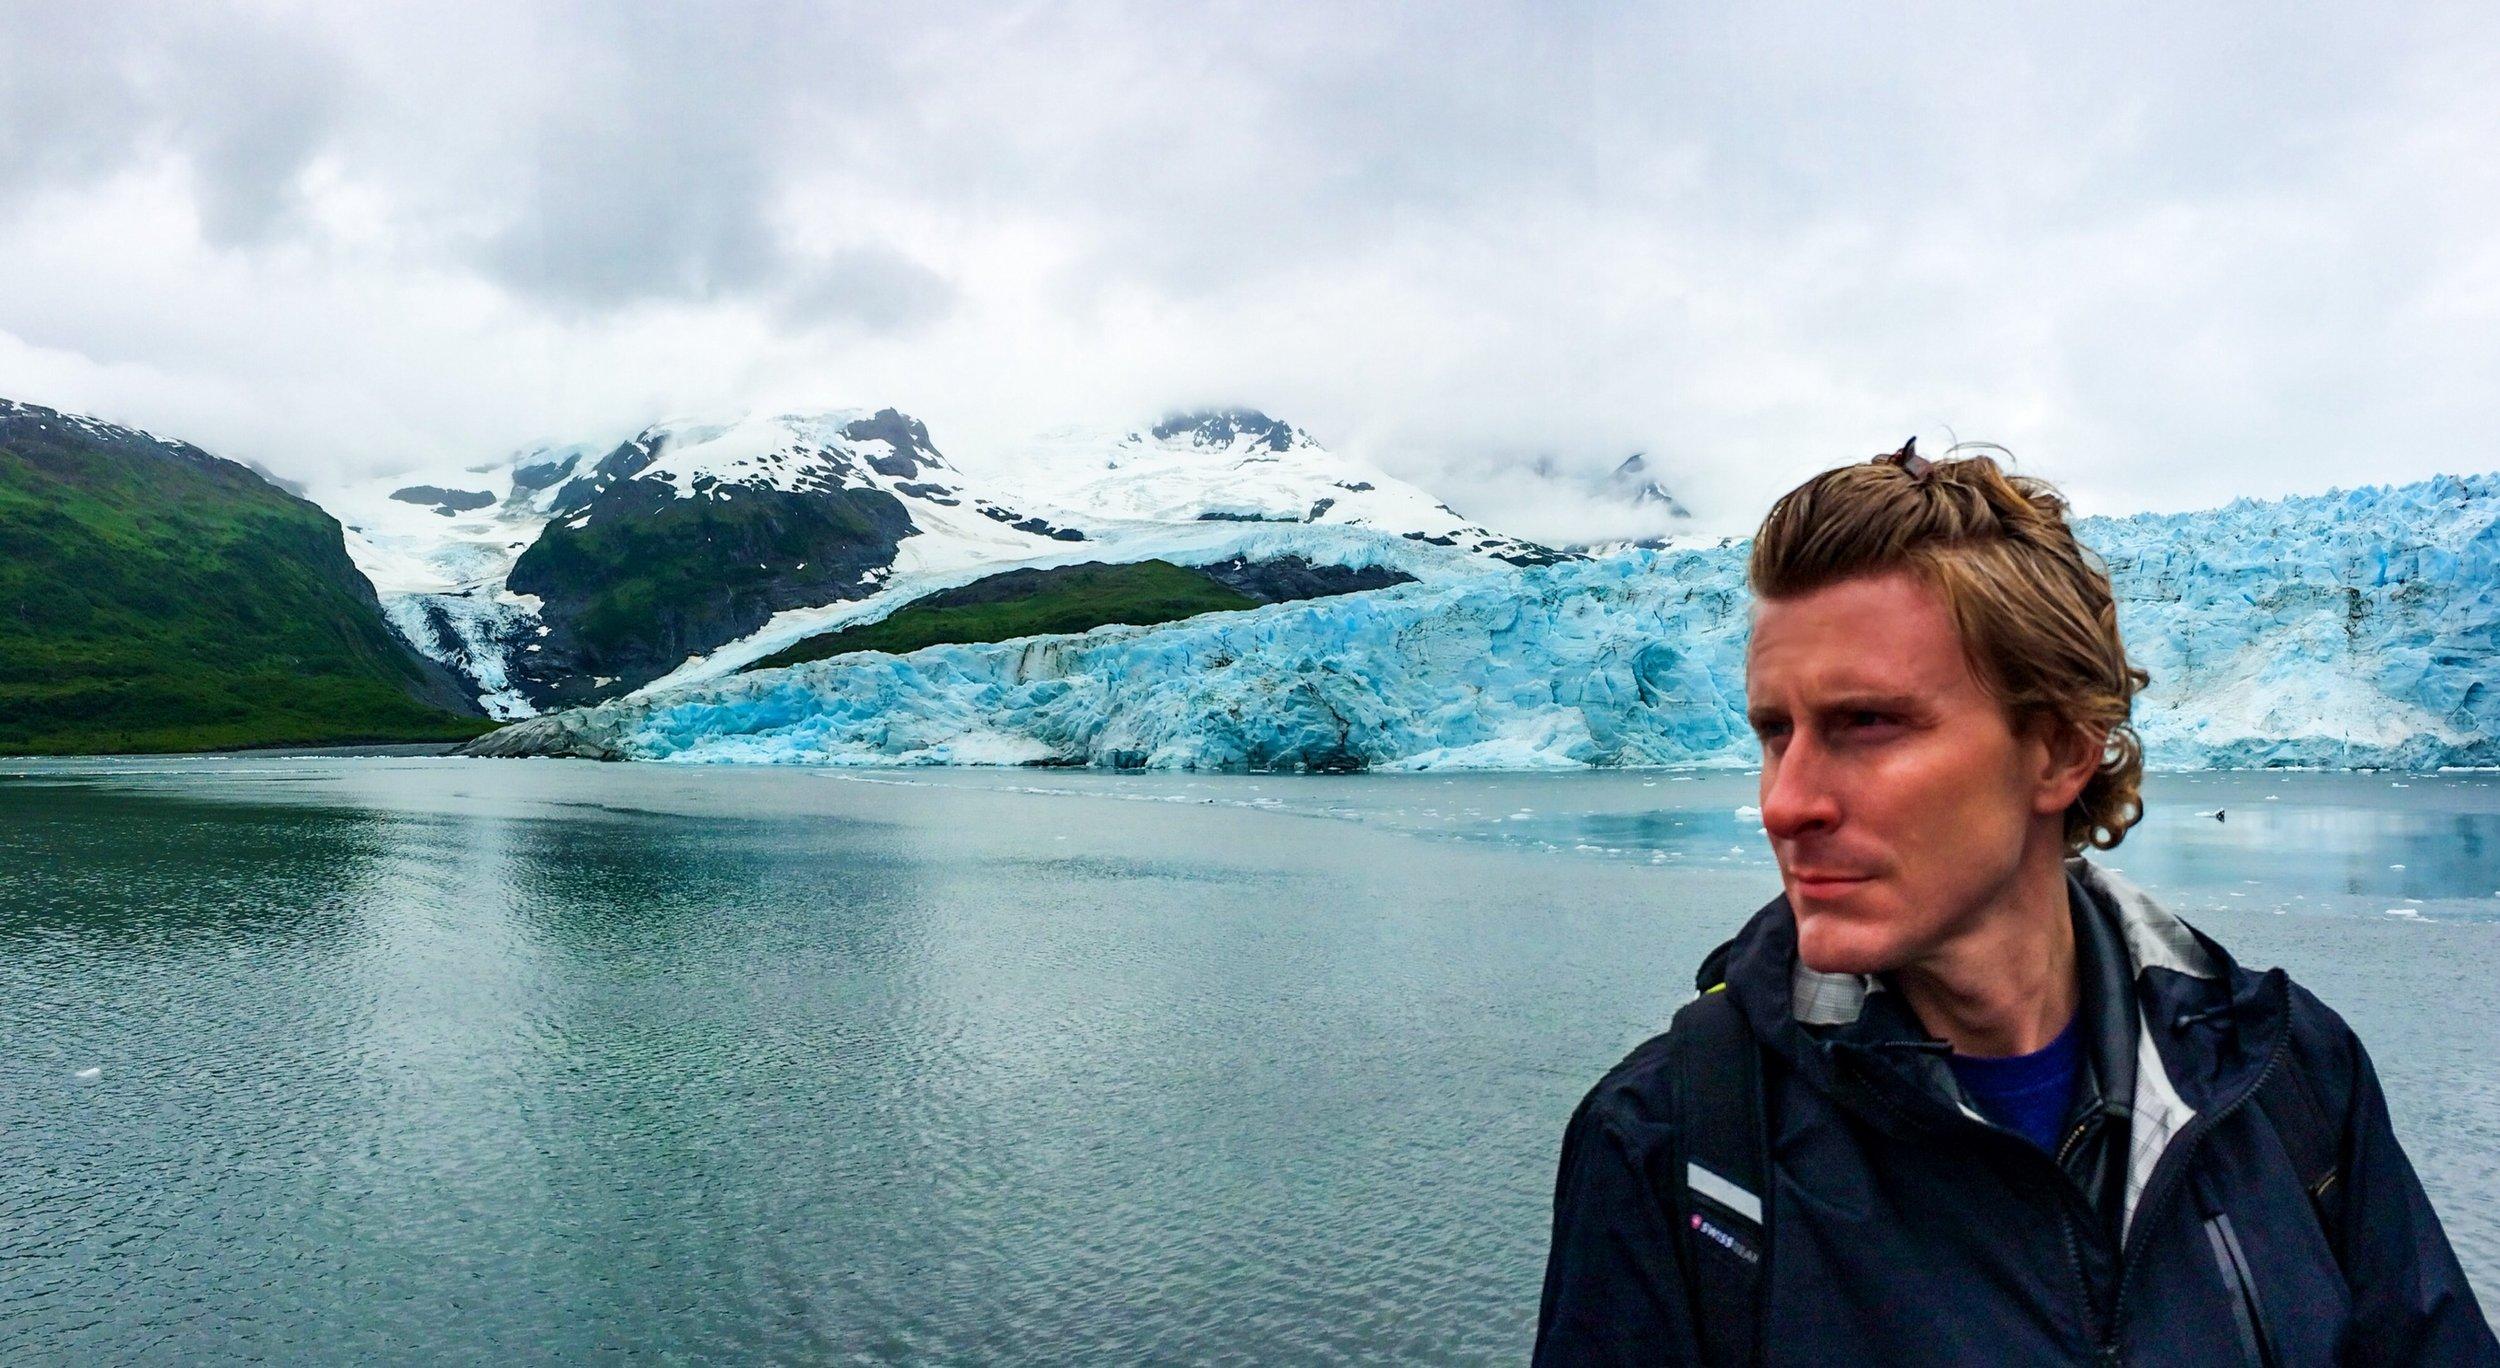 Hair growing, glacier melting